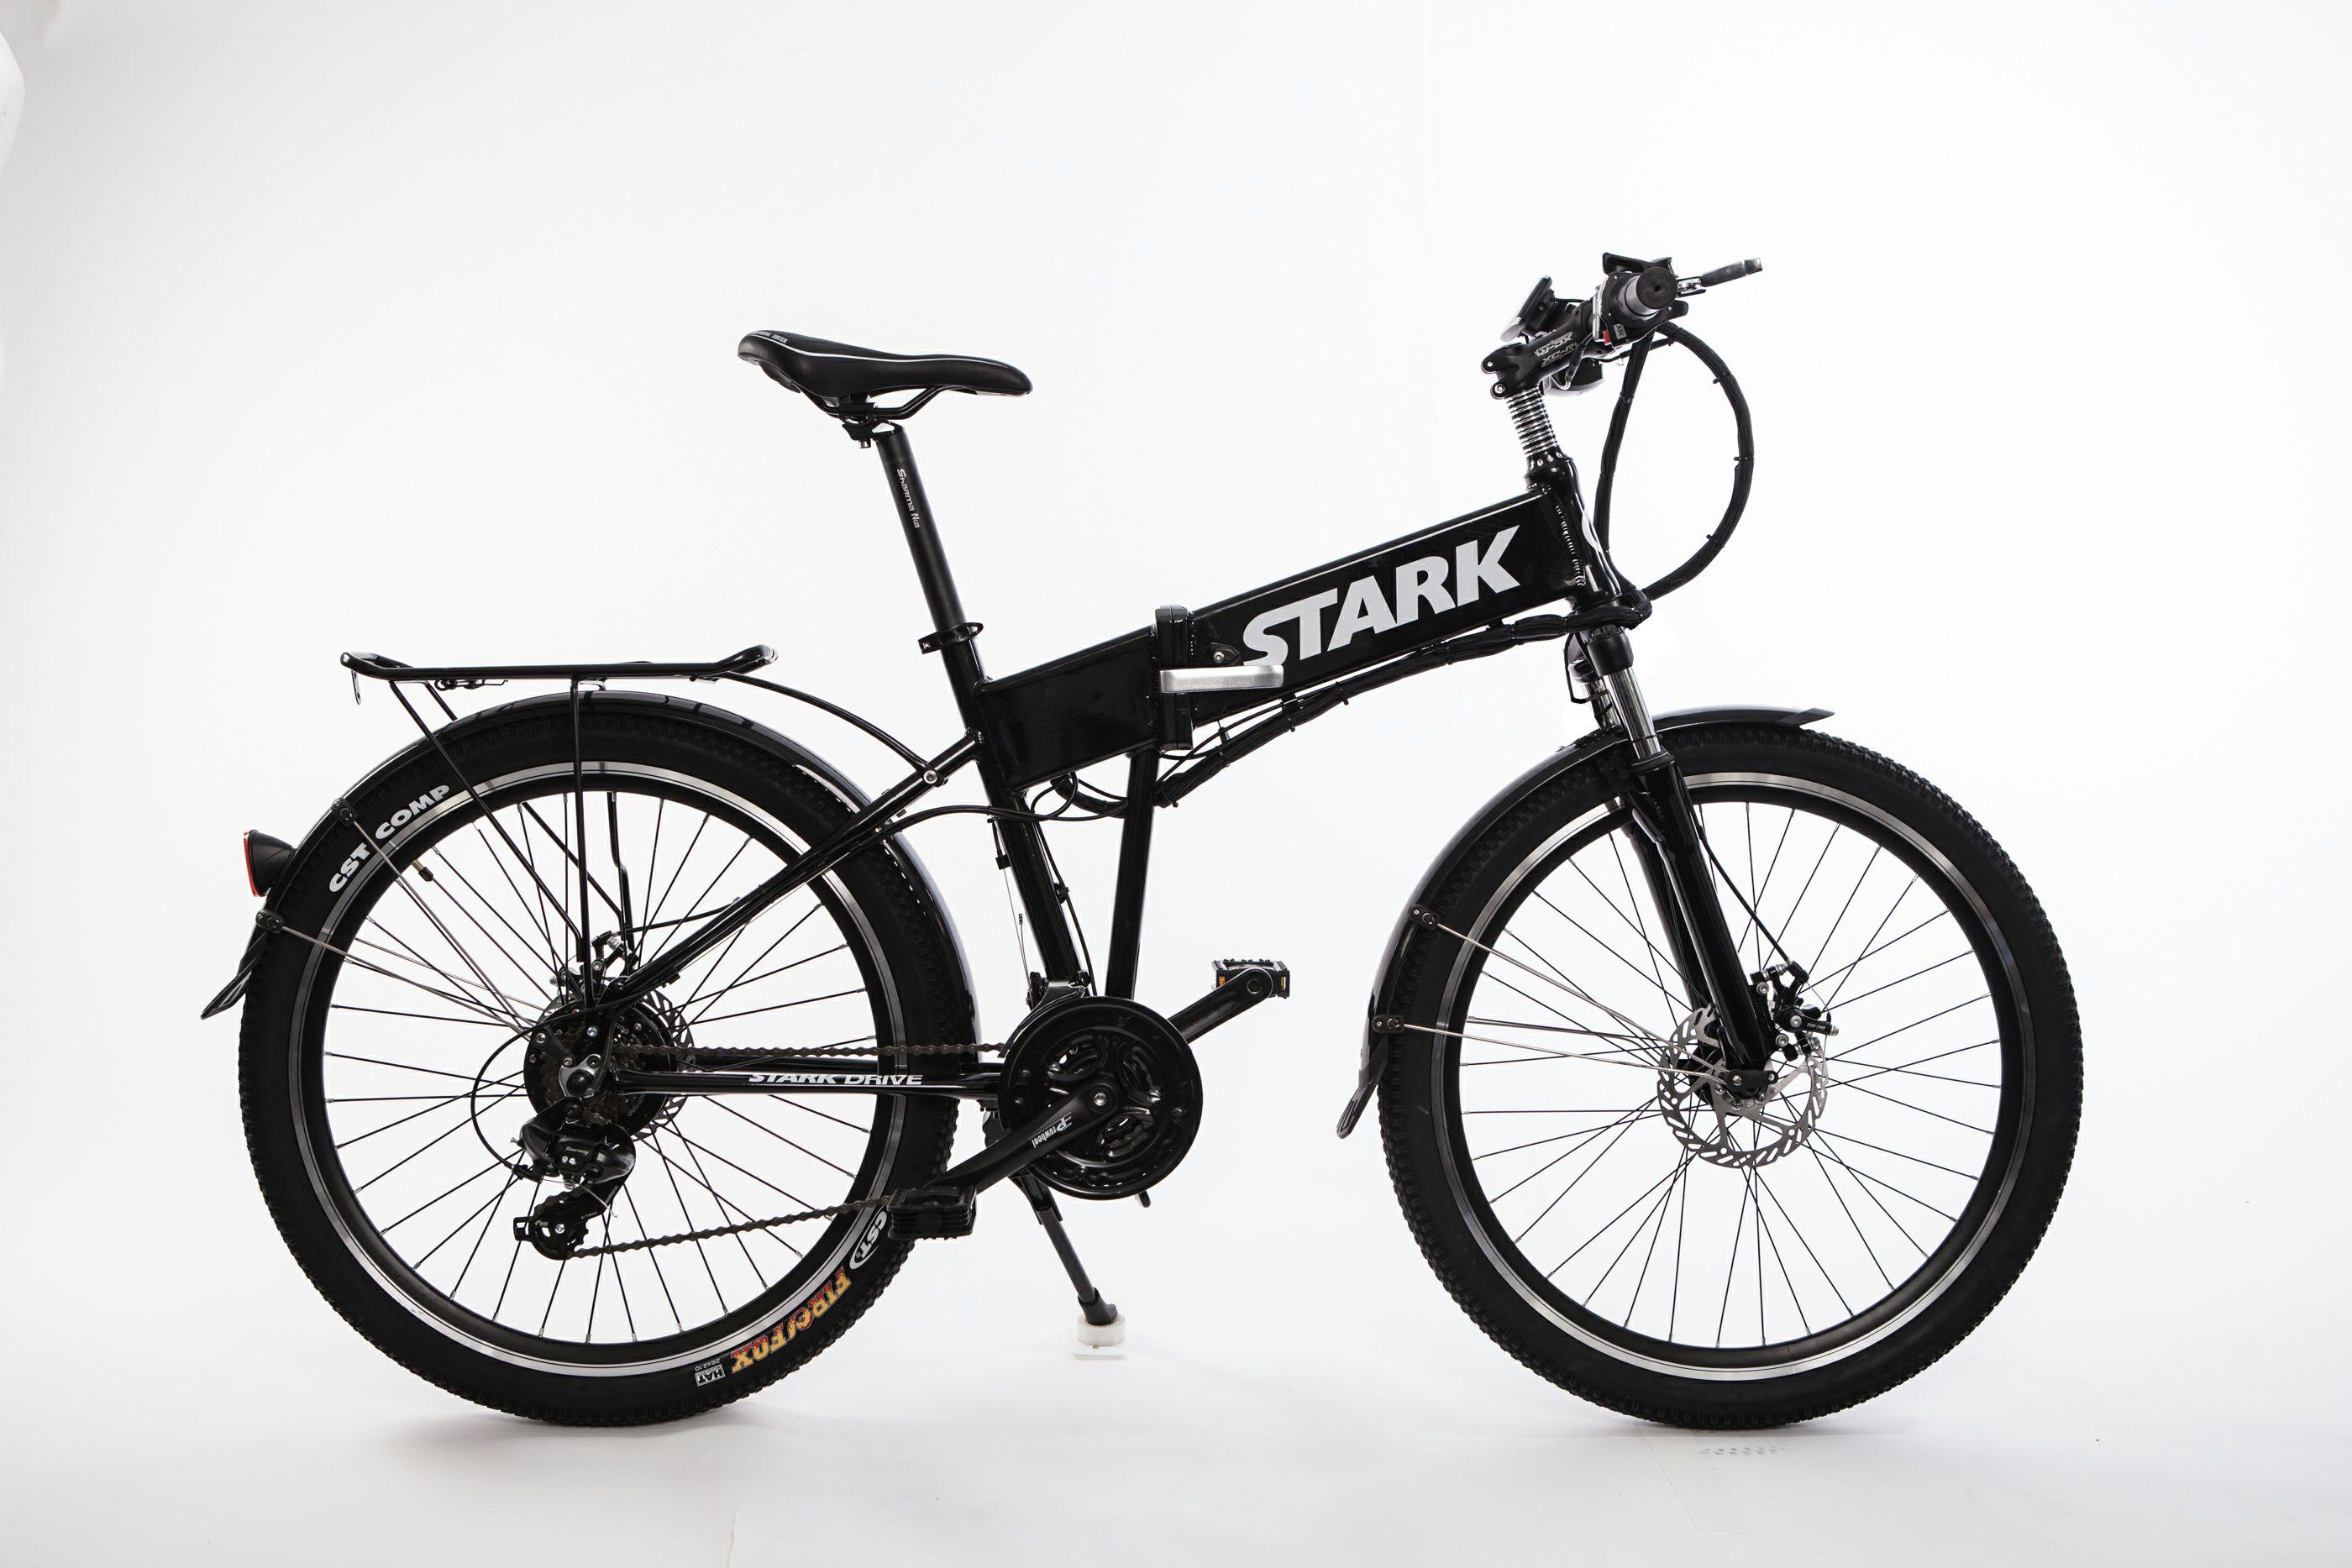 Stark E-bike Klapp Fahrrad 535€ Vorbestellung